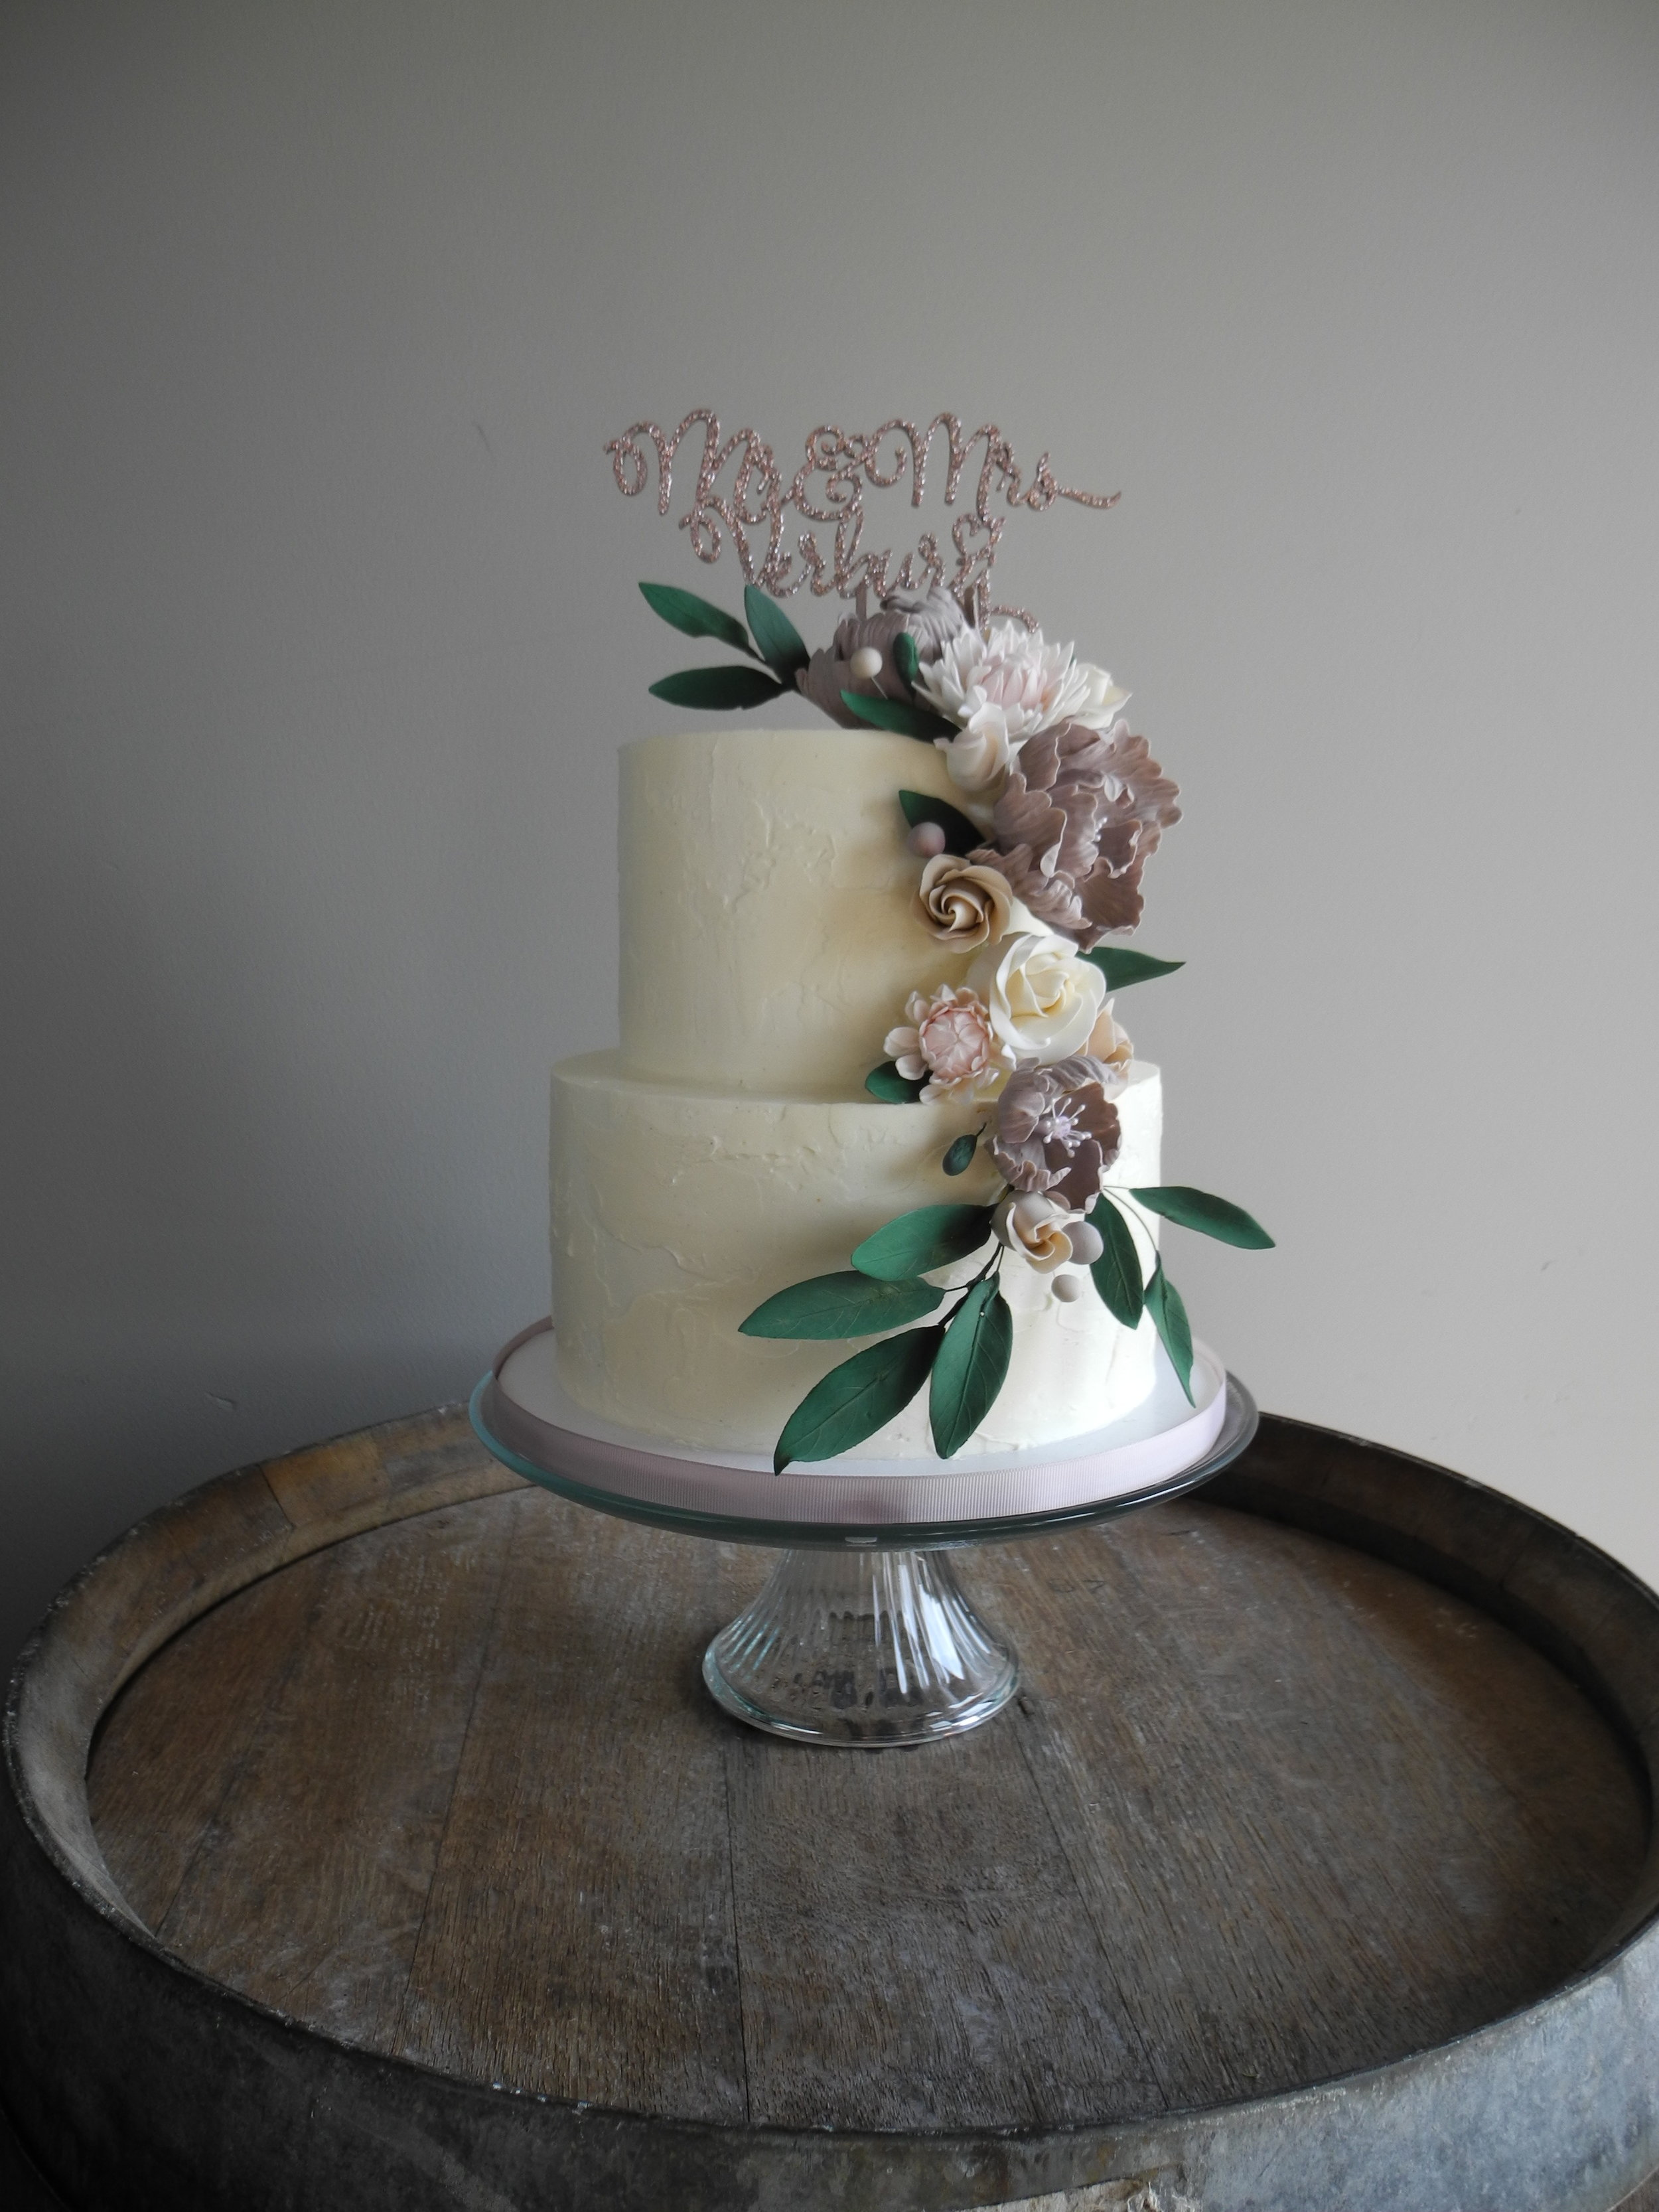 Bridal & Baby Shower Cakes | Bake Shop Studio London Ontario